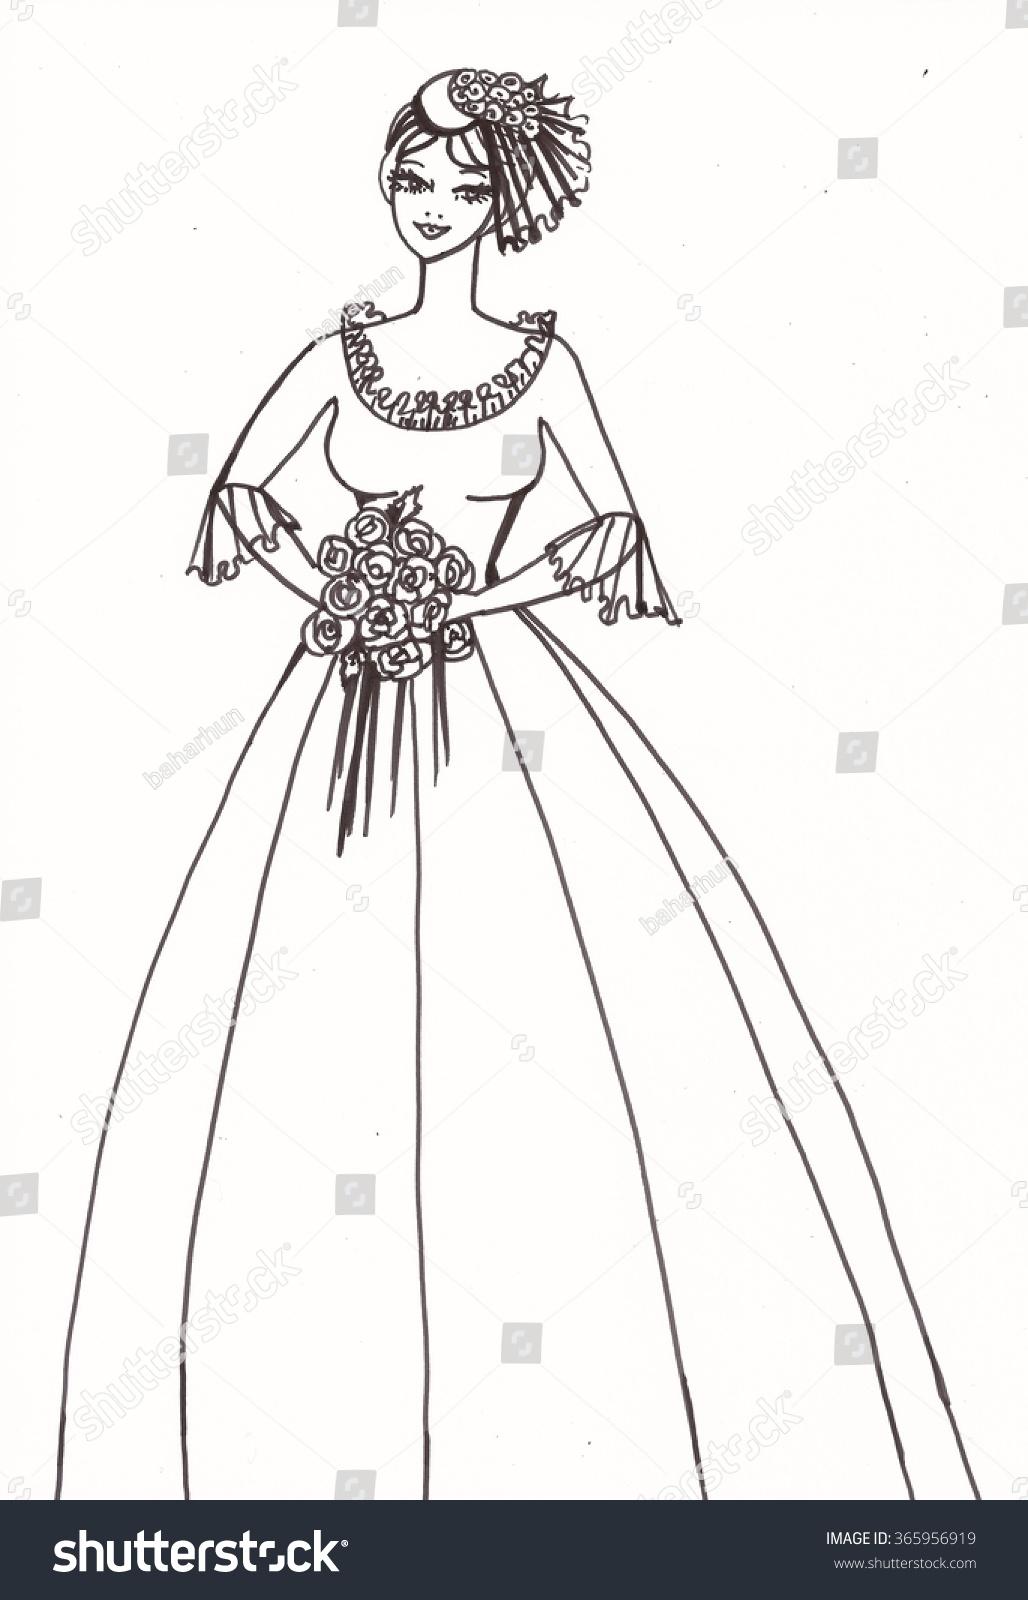 Pencil drawing wedding dress on beautiful bride model